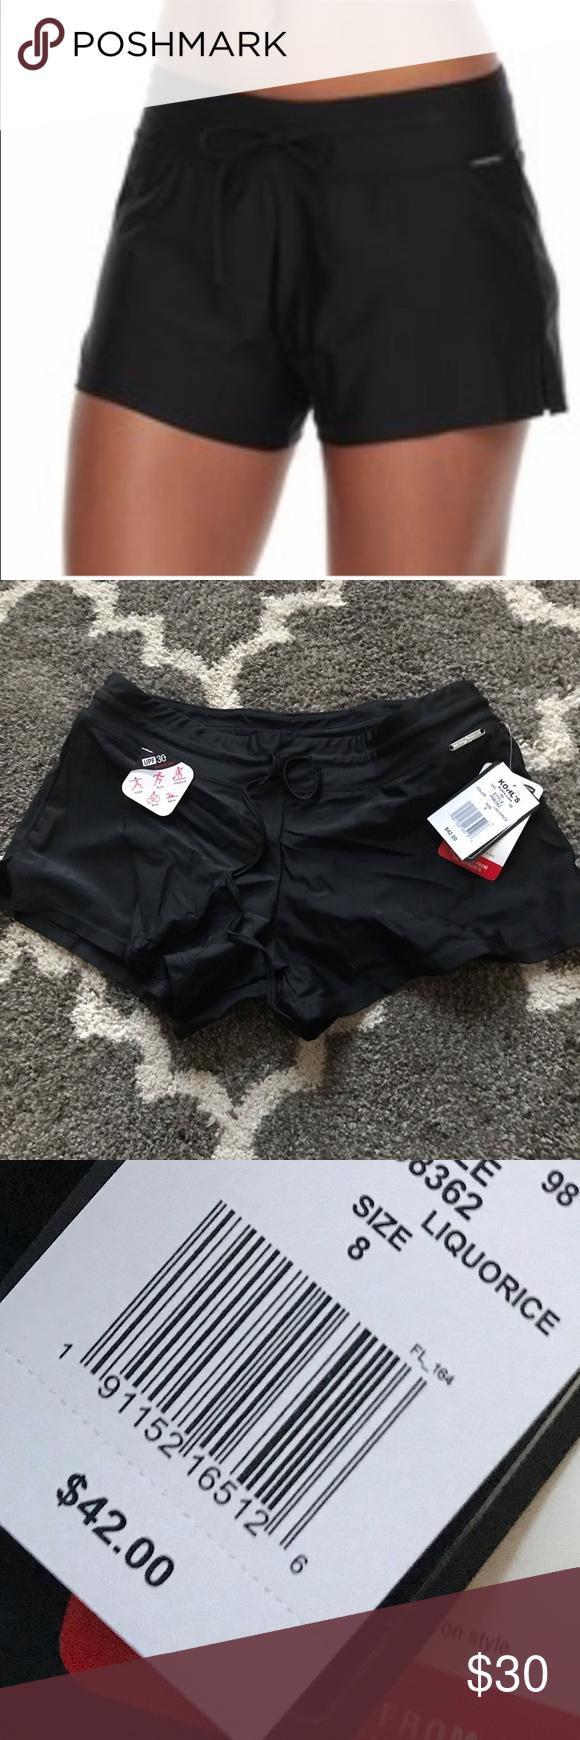 bb4a8699d8 Women's Solid Swim Shorts Brand new, never worn. Women's ZeroXposur Solid  Swim Shorts in Liquorice ZeroXposur Swim